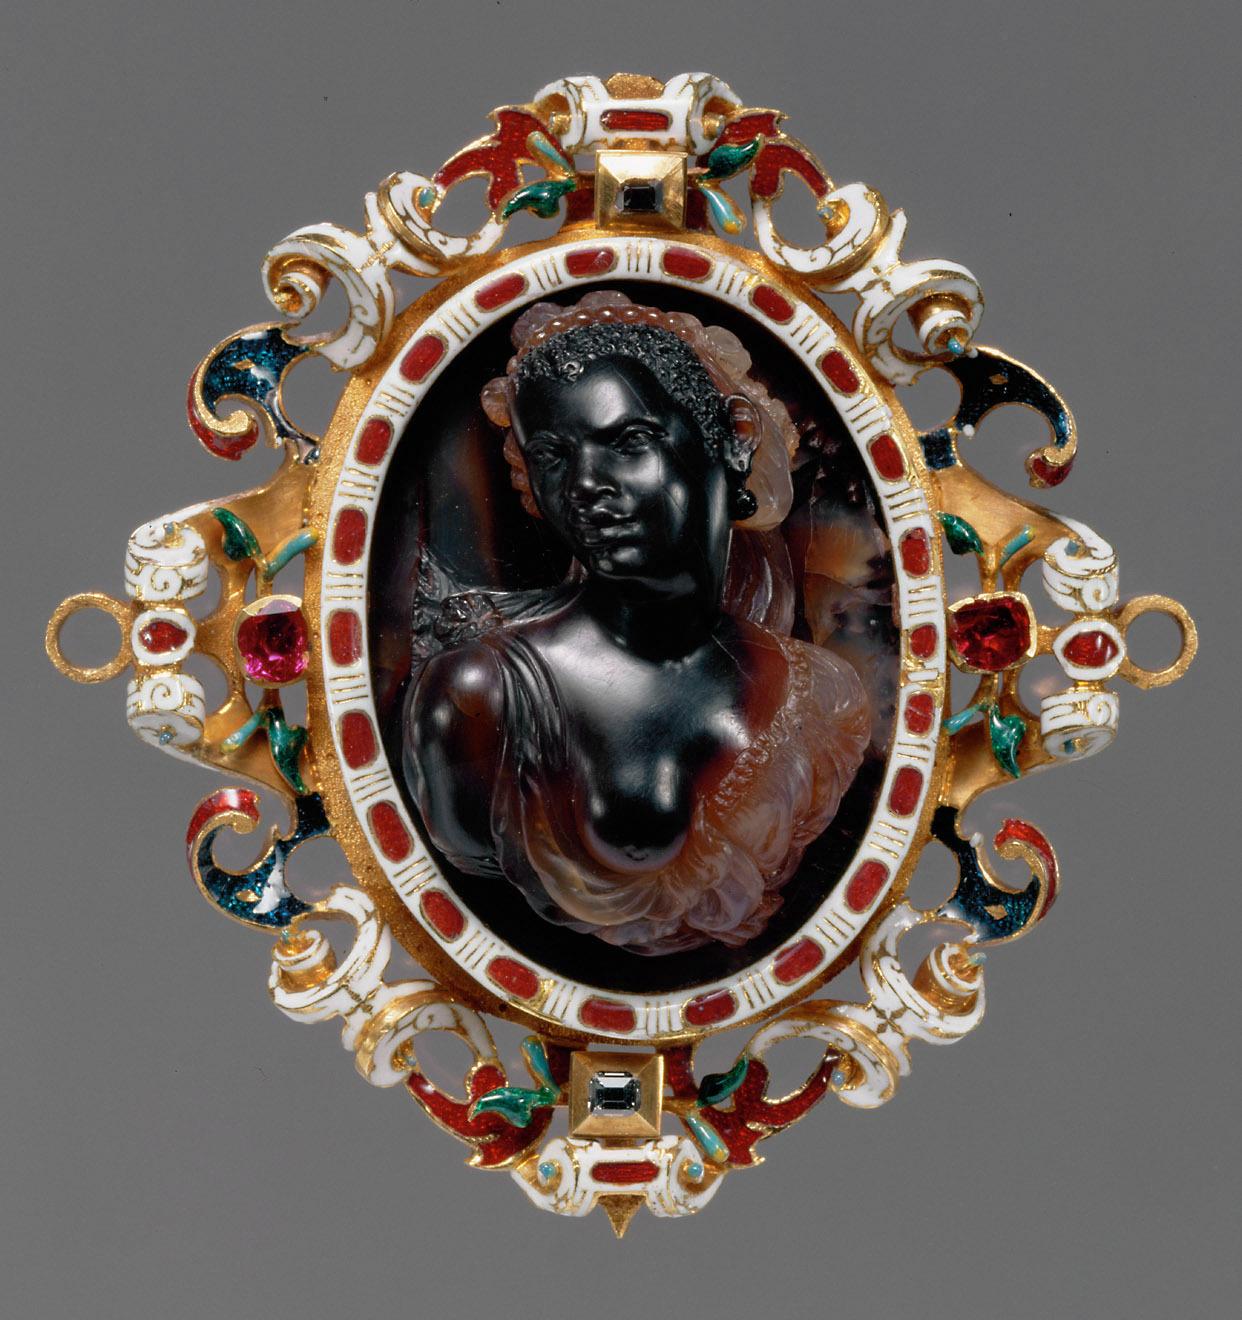 Brustbild einer Afrikanerin von Girolamo Miseroni